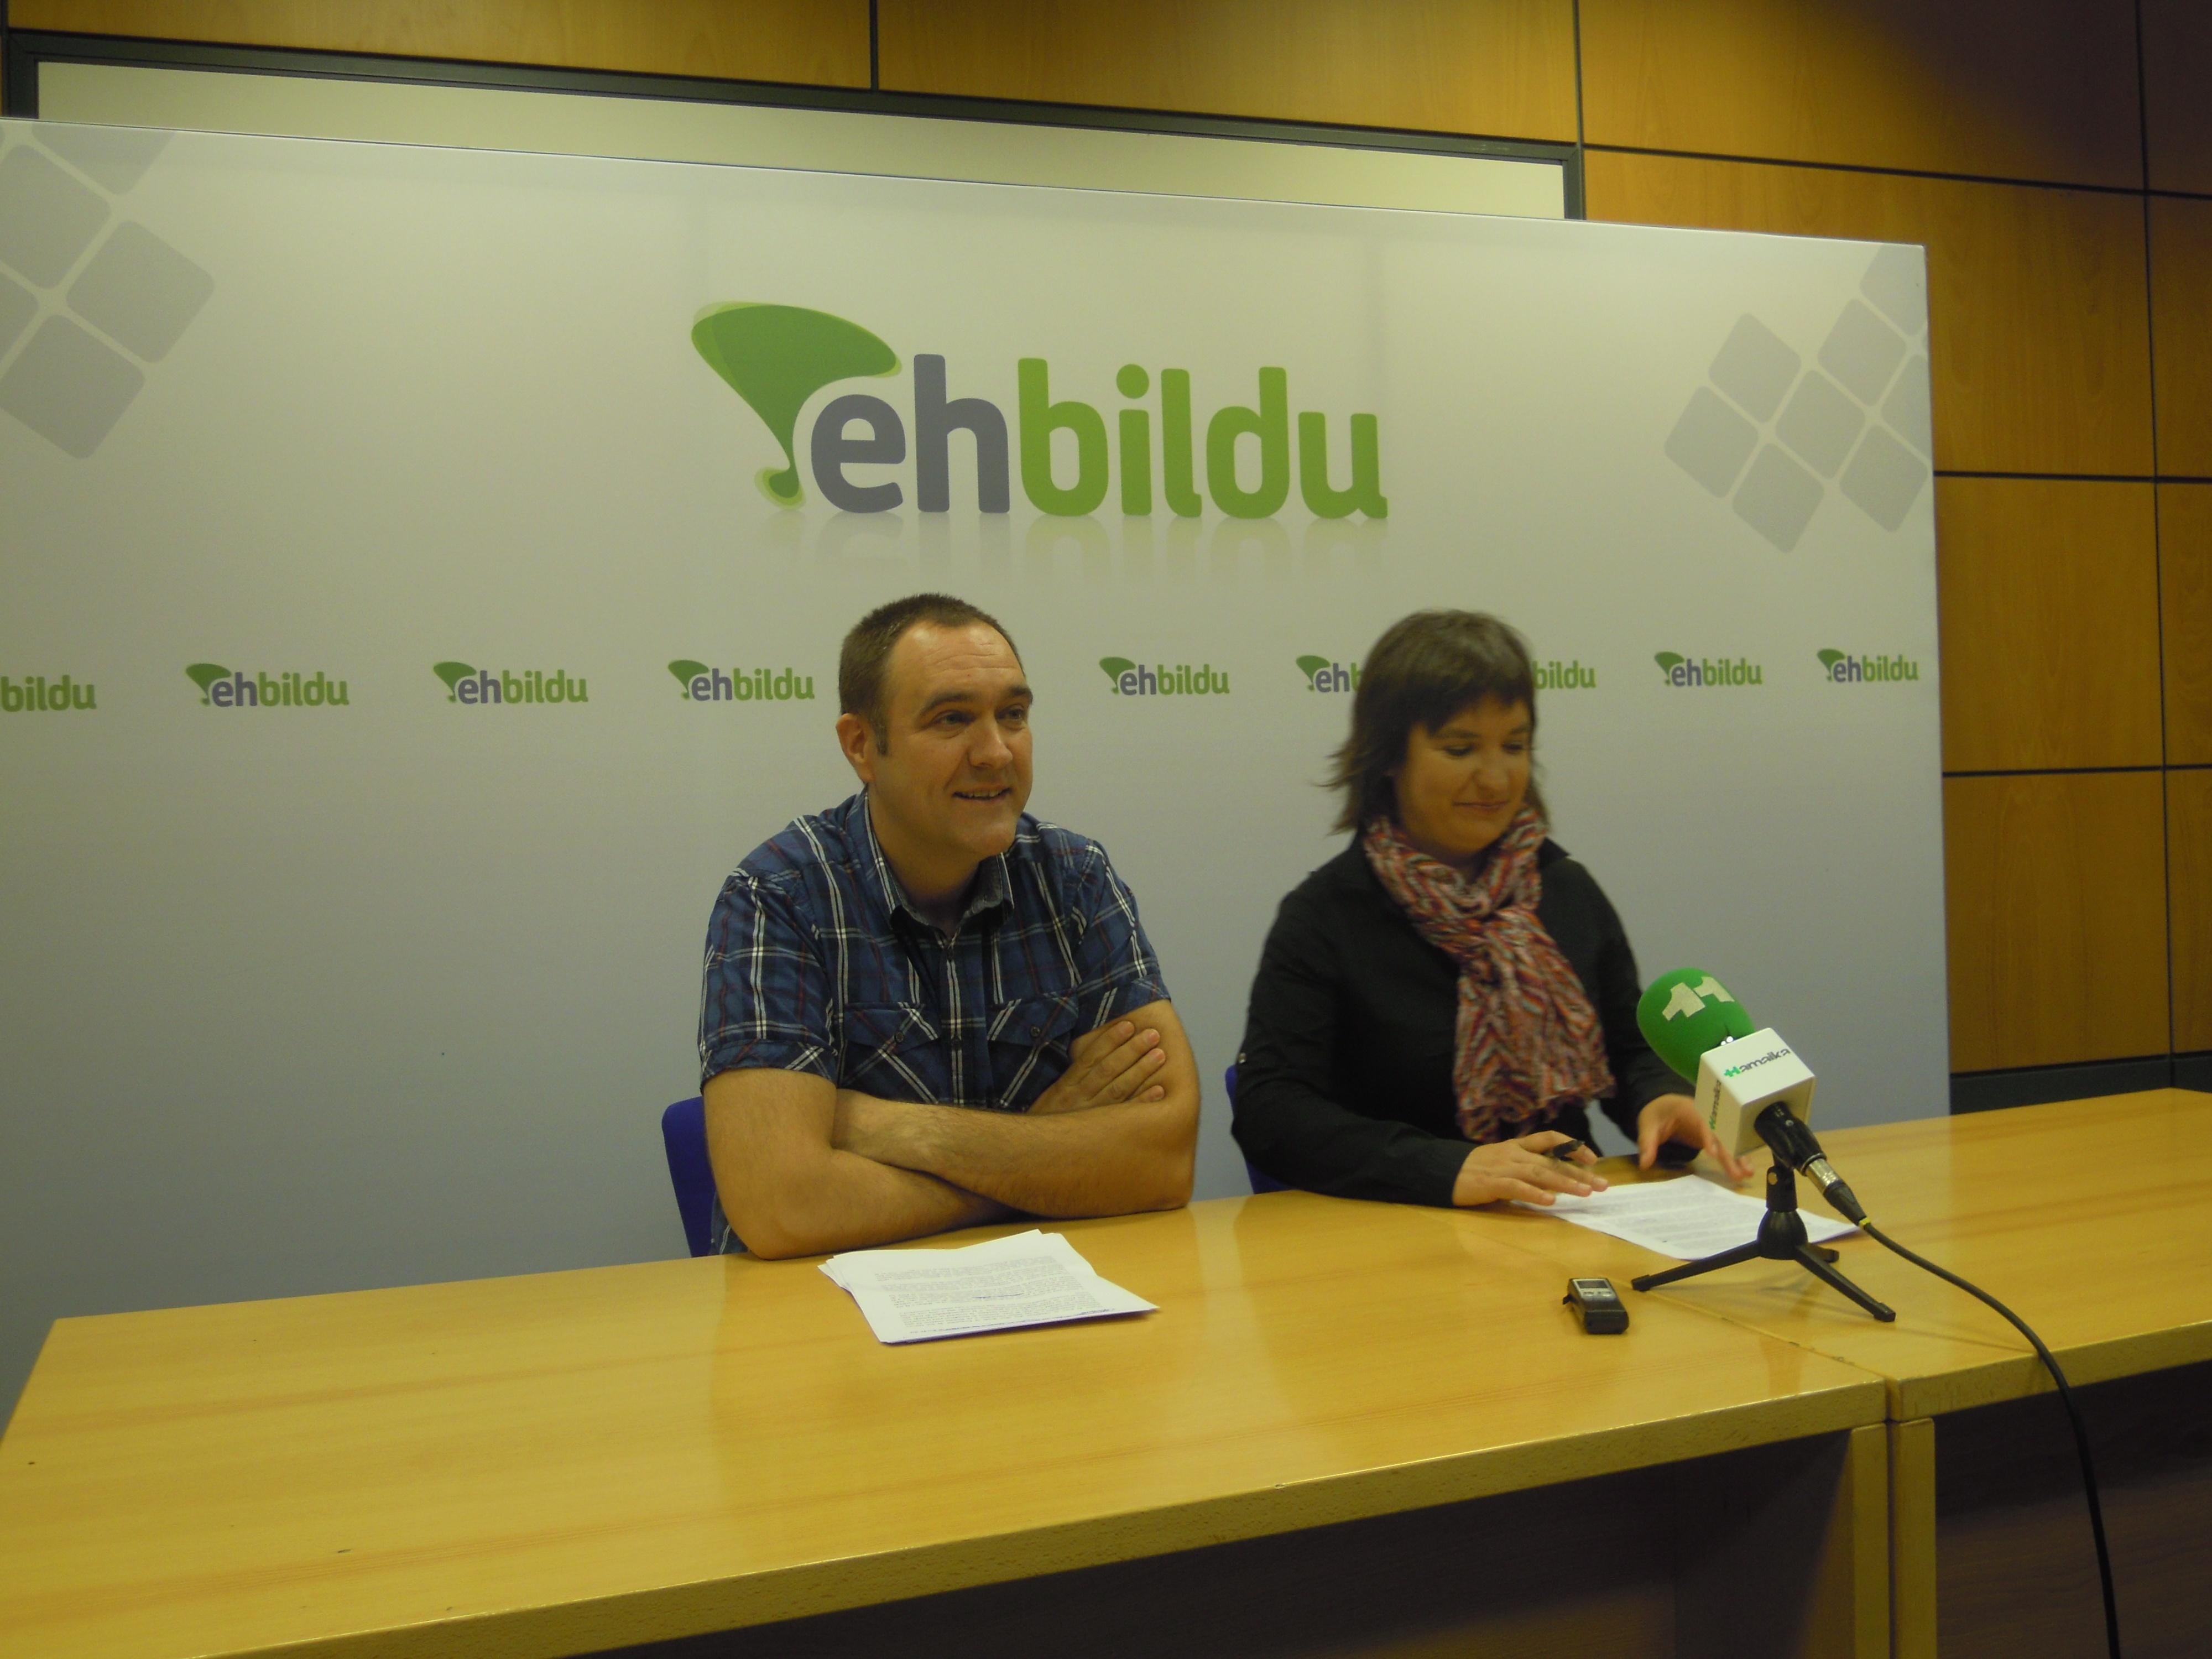 La gestión municipal pasa factura a Bildu